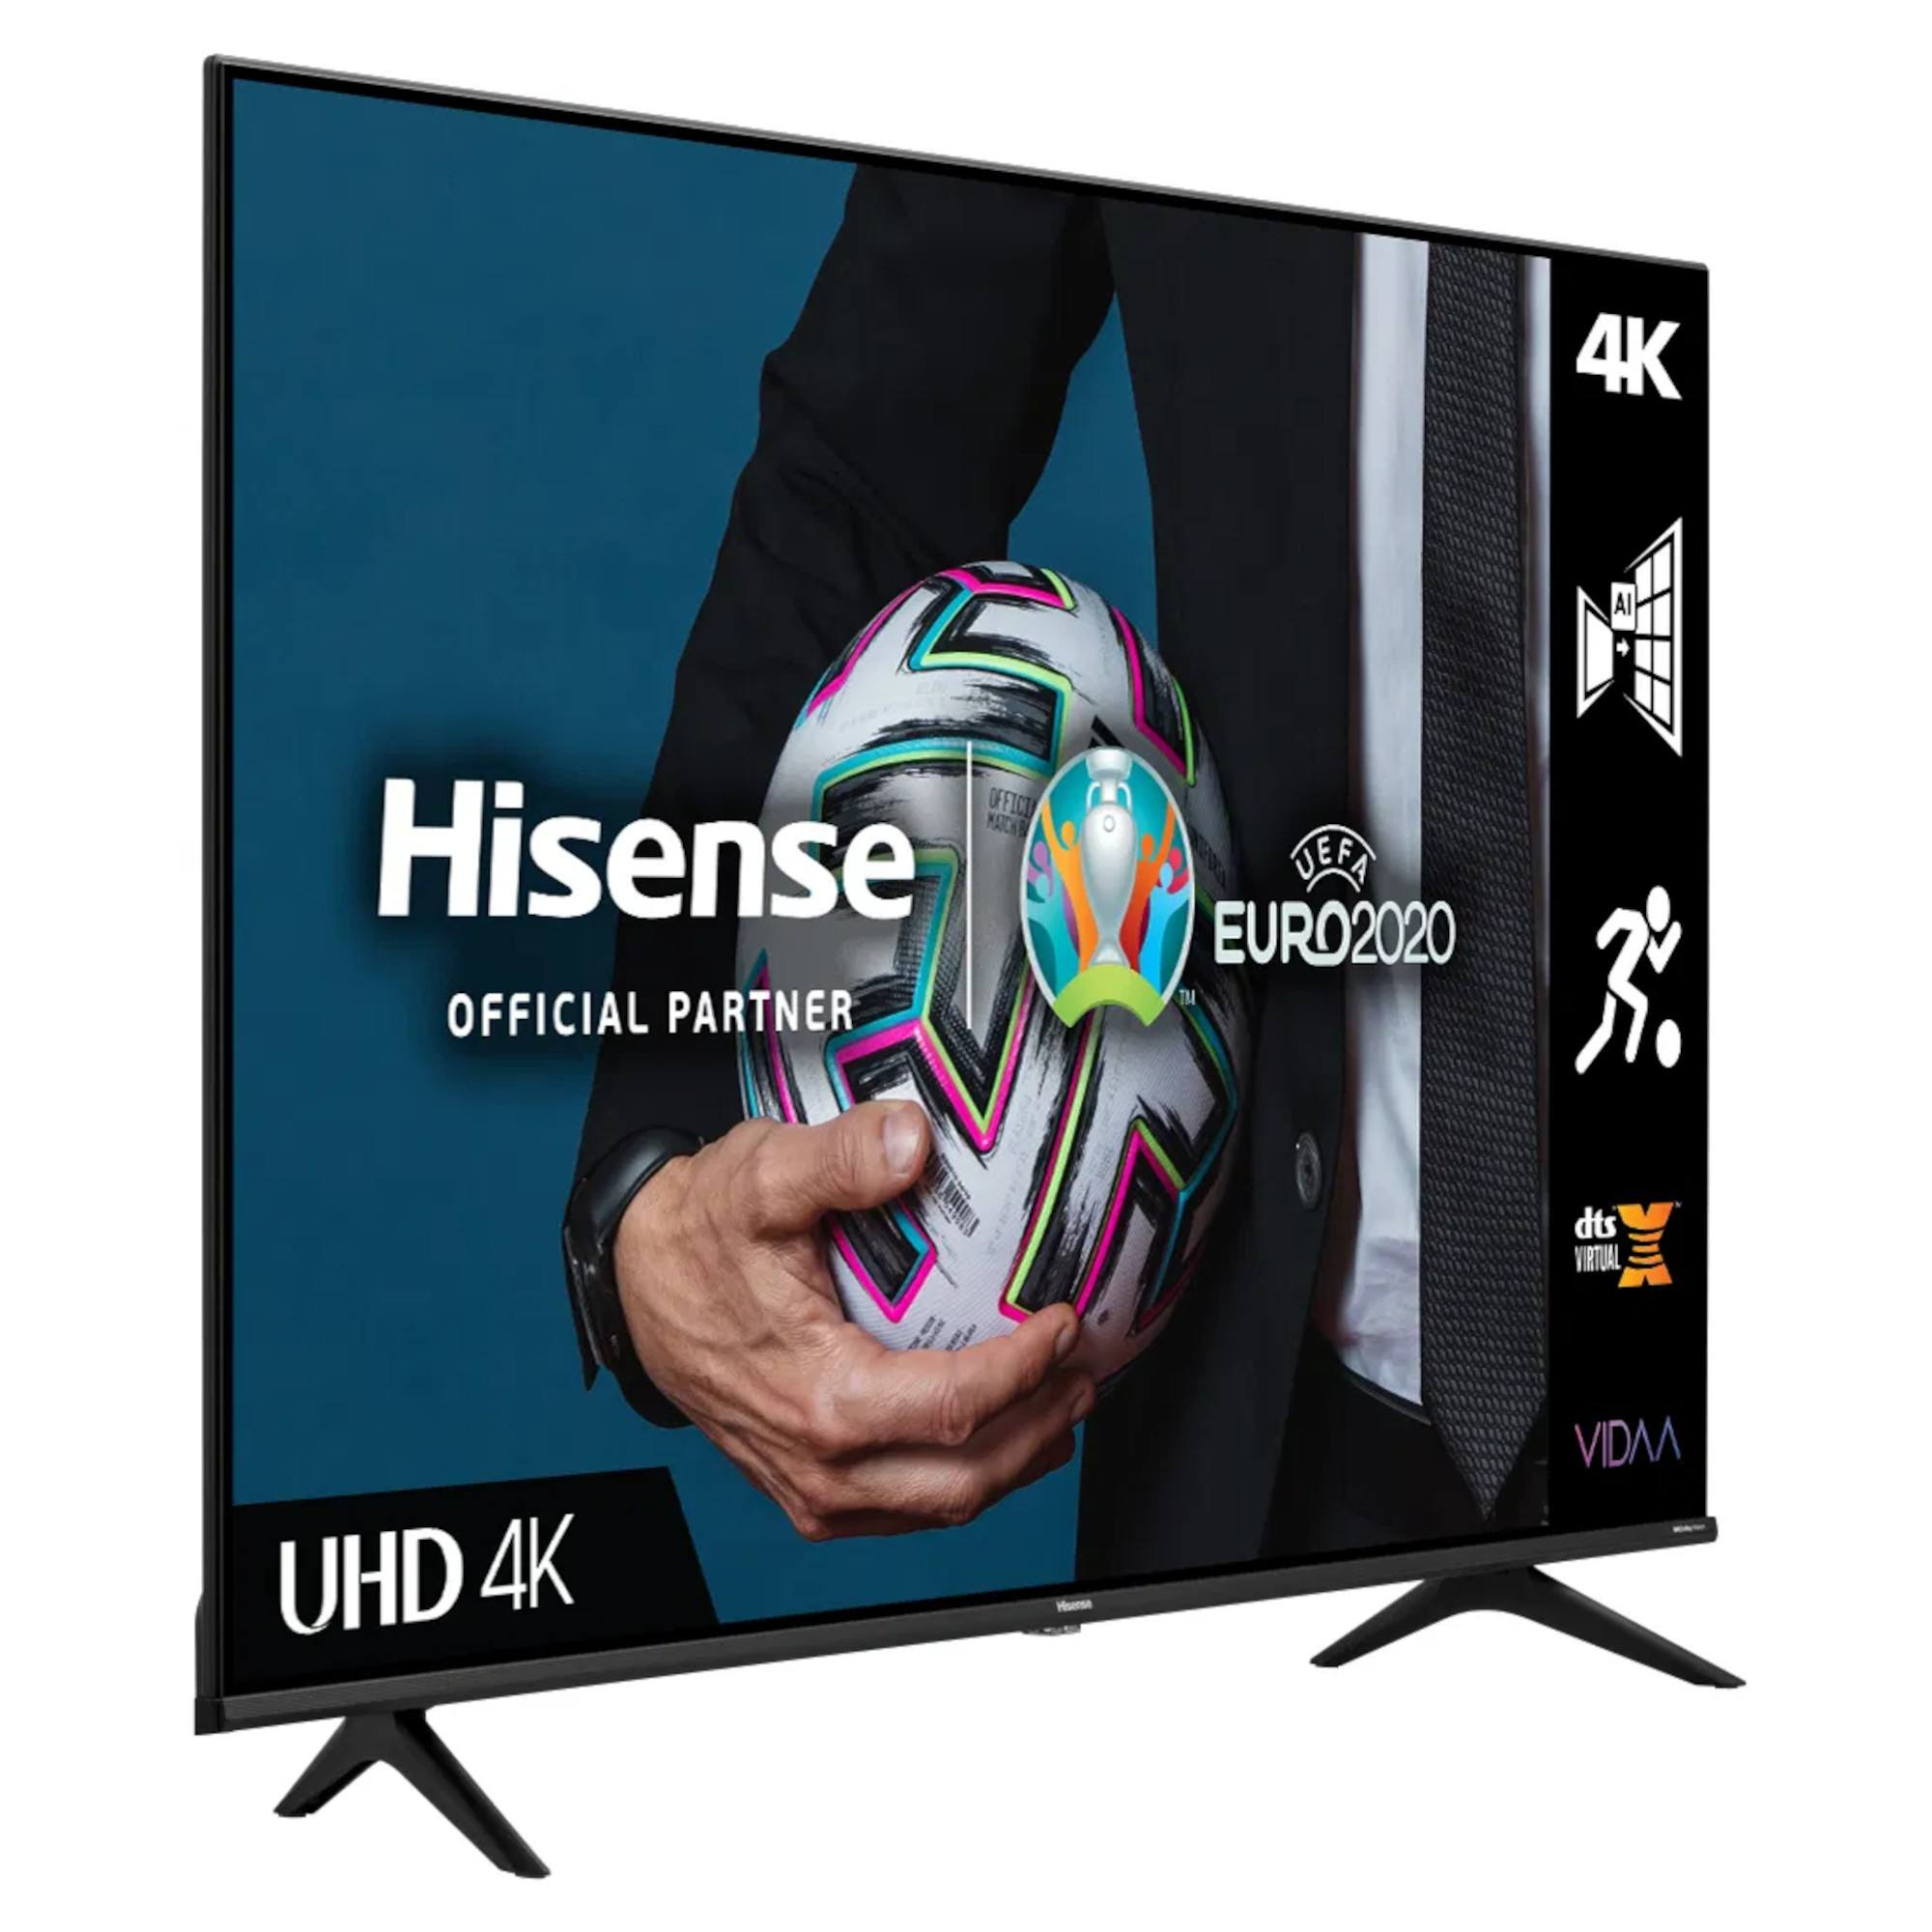 thumbnail 3 - Hisense A6G Series H43A6GTUK 43 HDR 4K Ultra HD DLED TV